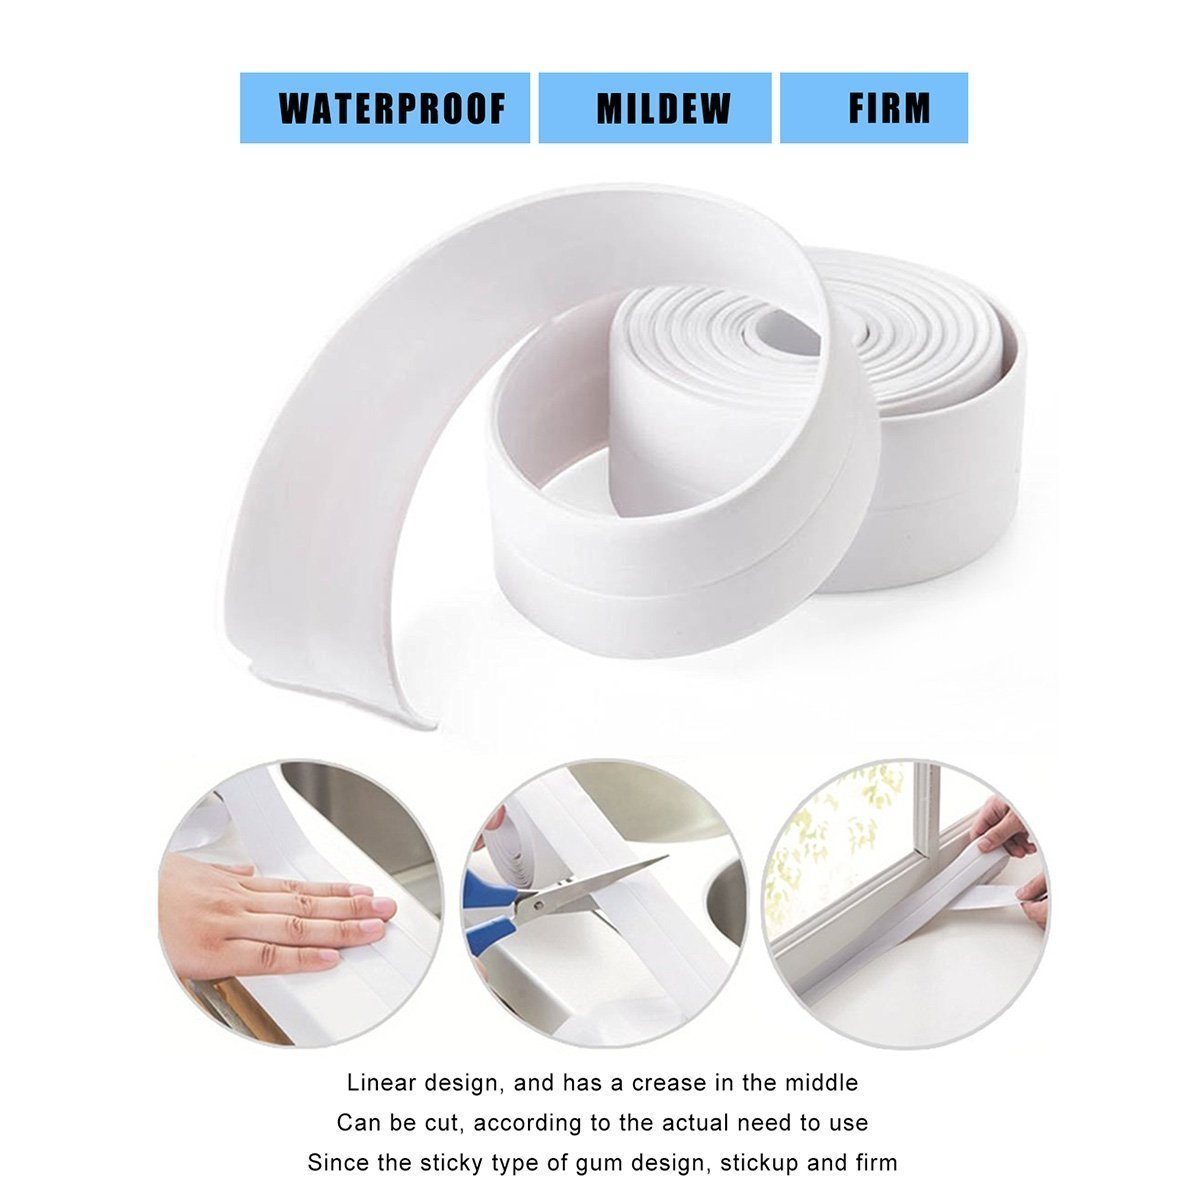 Honana 3.8mm Kitchen Bathroom Self Adhesive Wall Seal Ring Tape Waterproof Tape Mold Proof Edge Trim Tape Accessory 10